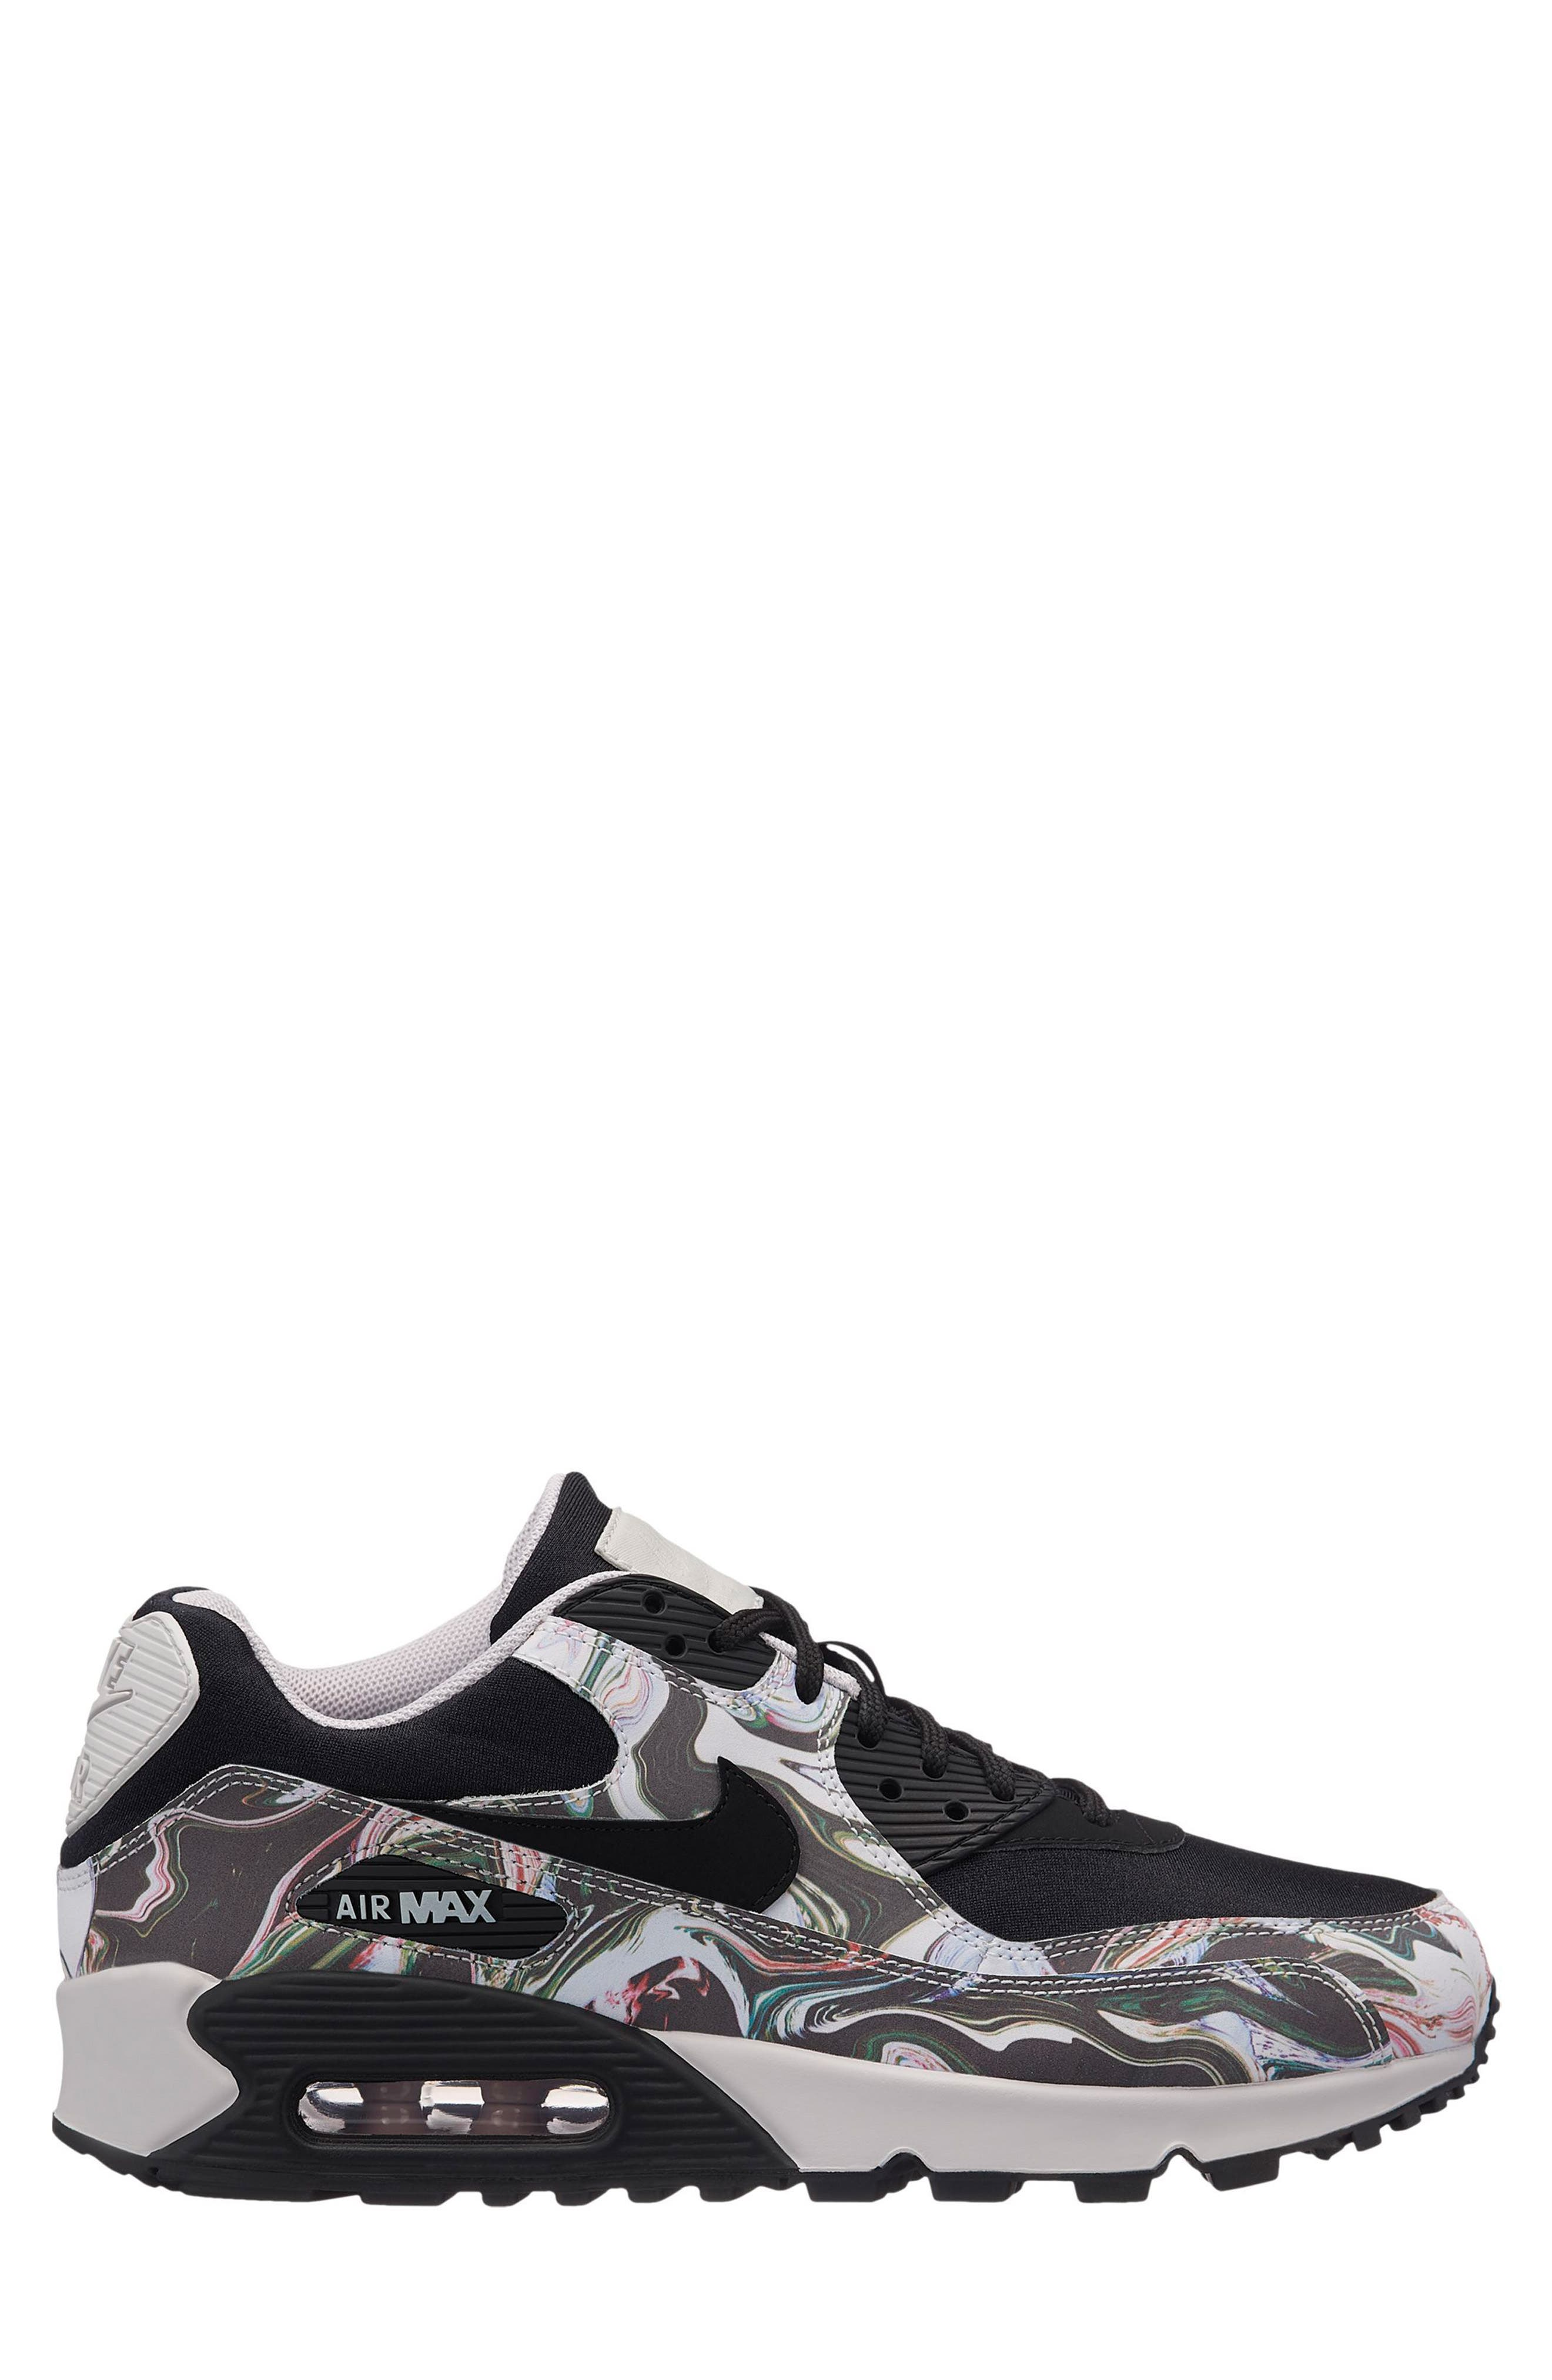 Air Max 90 Marble Sneaker,                         Main,                         color, 001